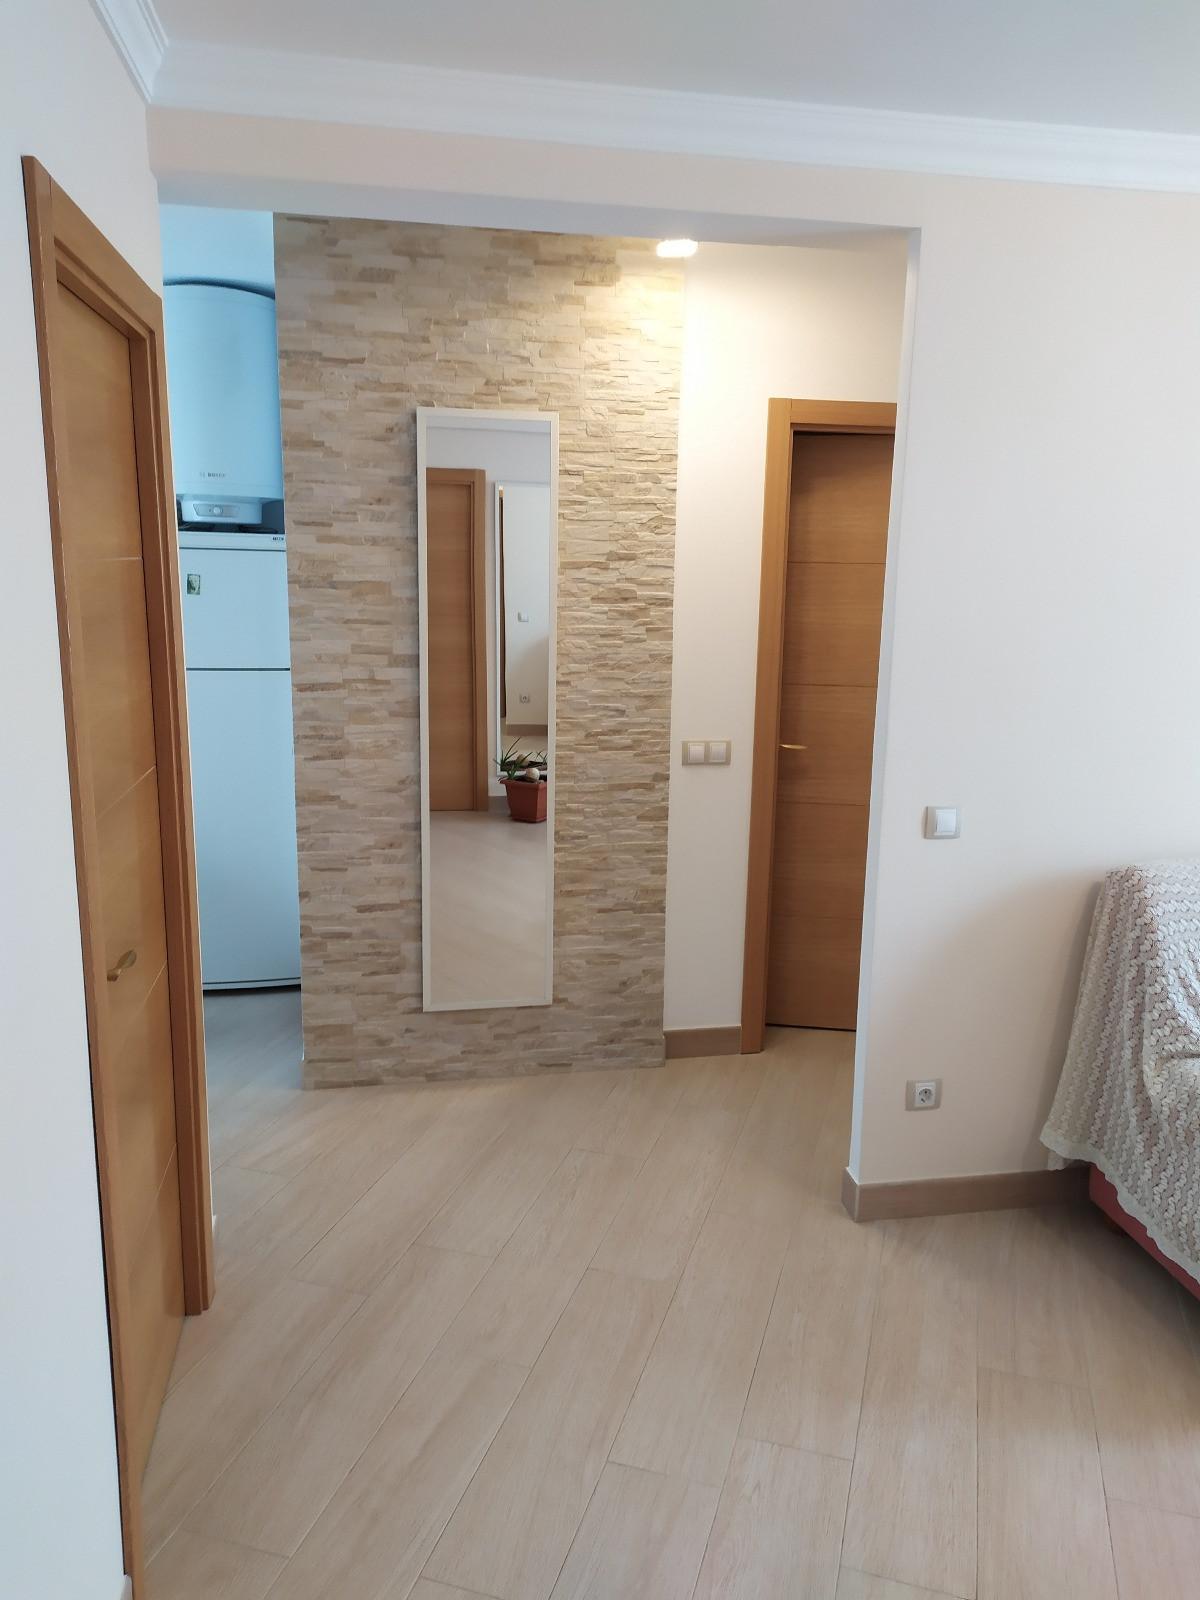 Apartamento - Fuengirola - R3763804 - mibgroup.es